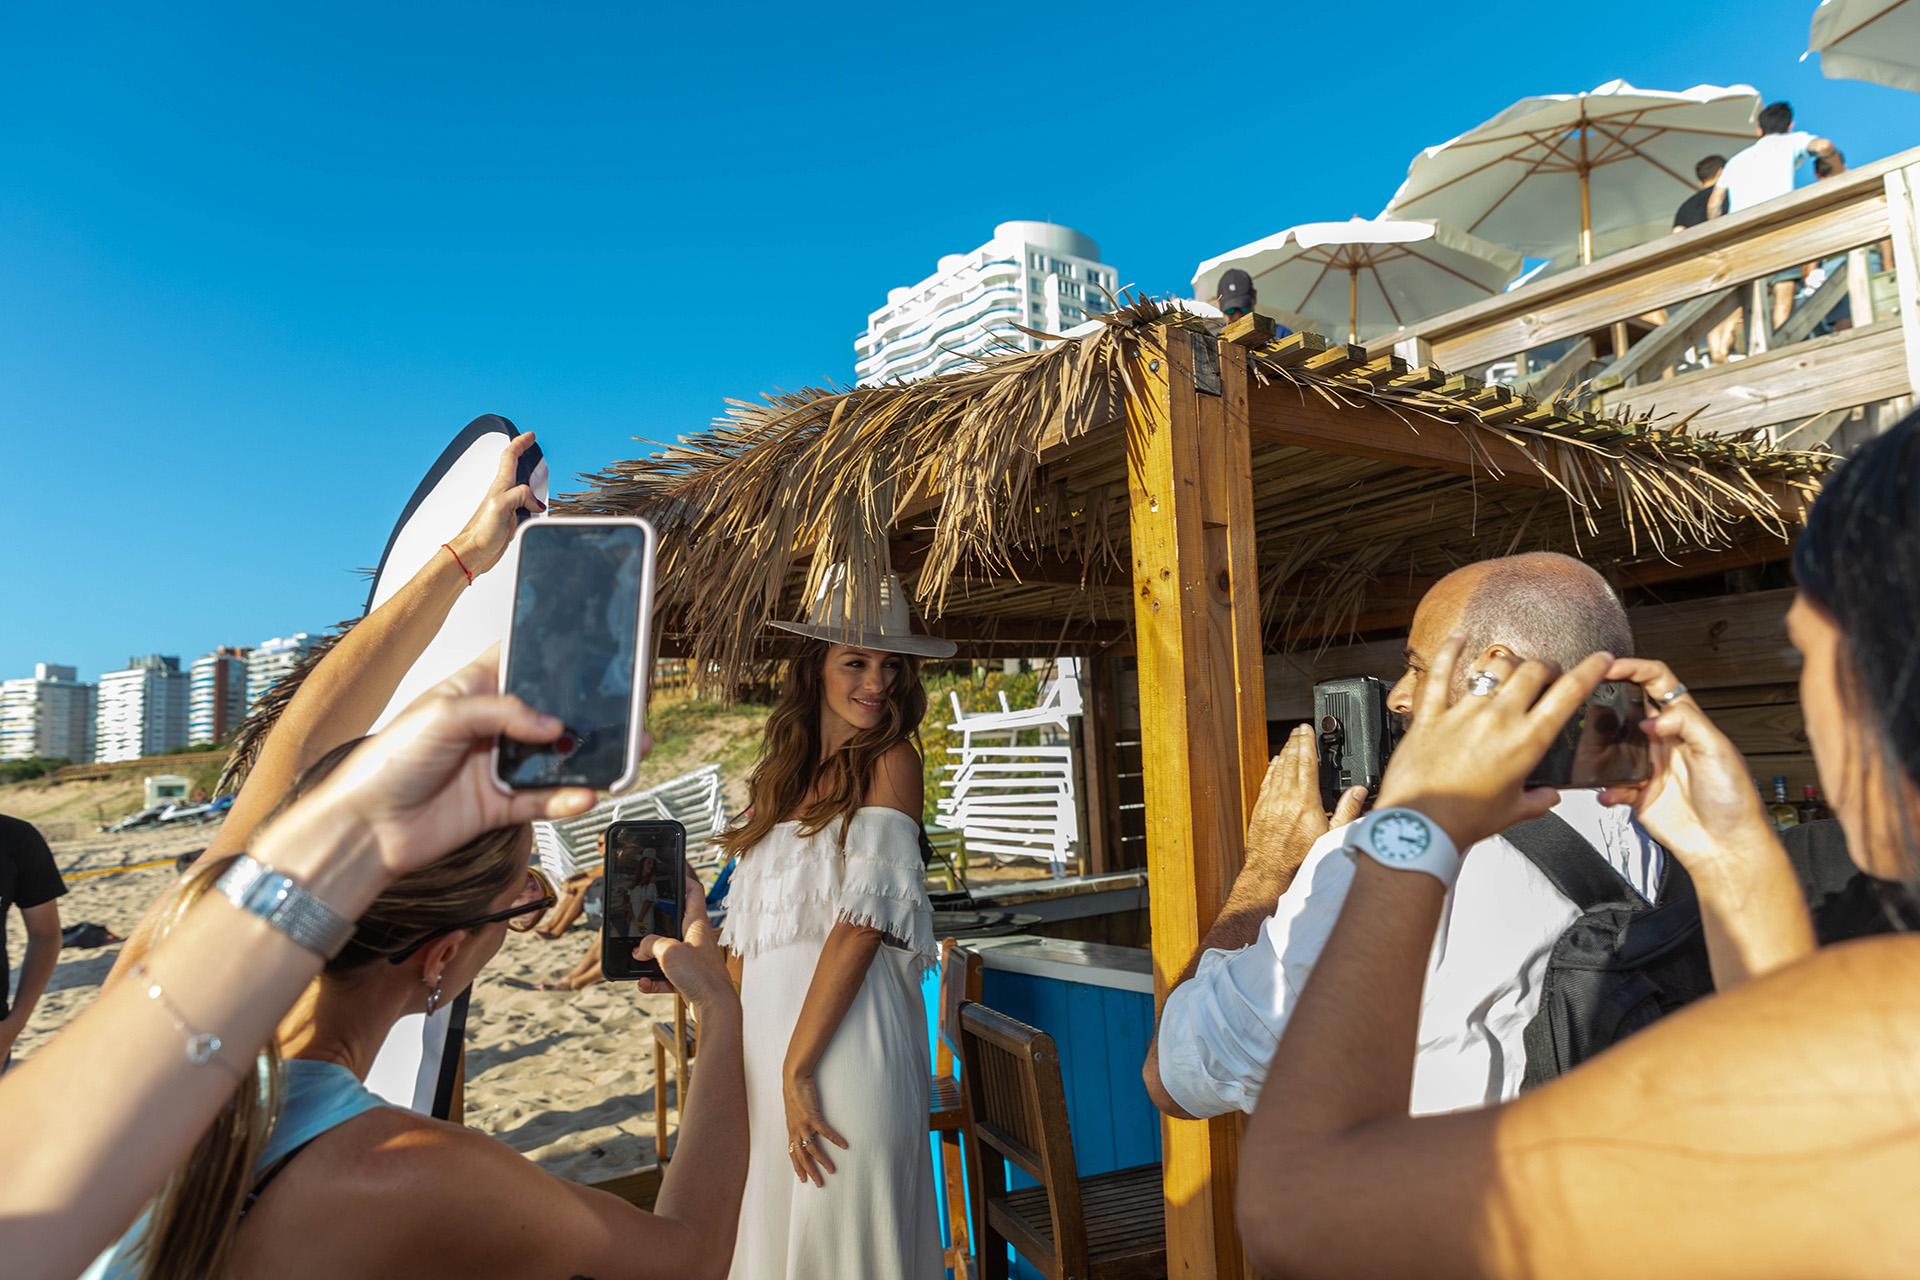 Junto al fotógrafo profesional, se amontonaron un montón de turistas con sus celulares para tratar de retratar a Pampita